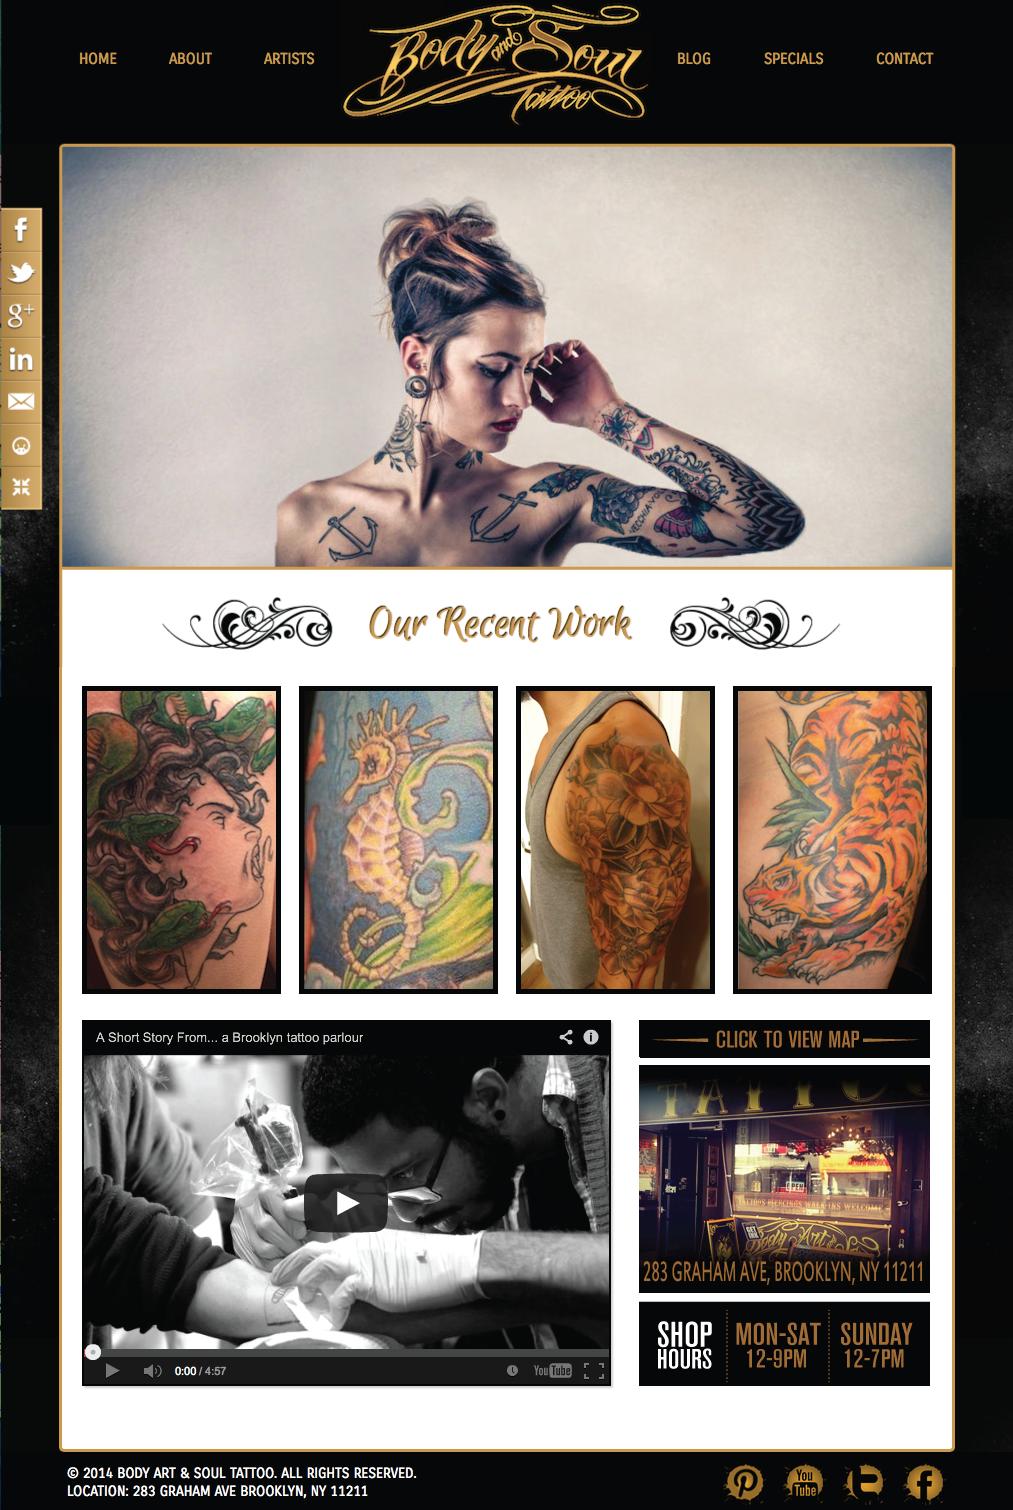 Tattoo Shop Website Design | WordPress Website Design NJ | NJ Web ...